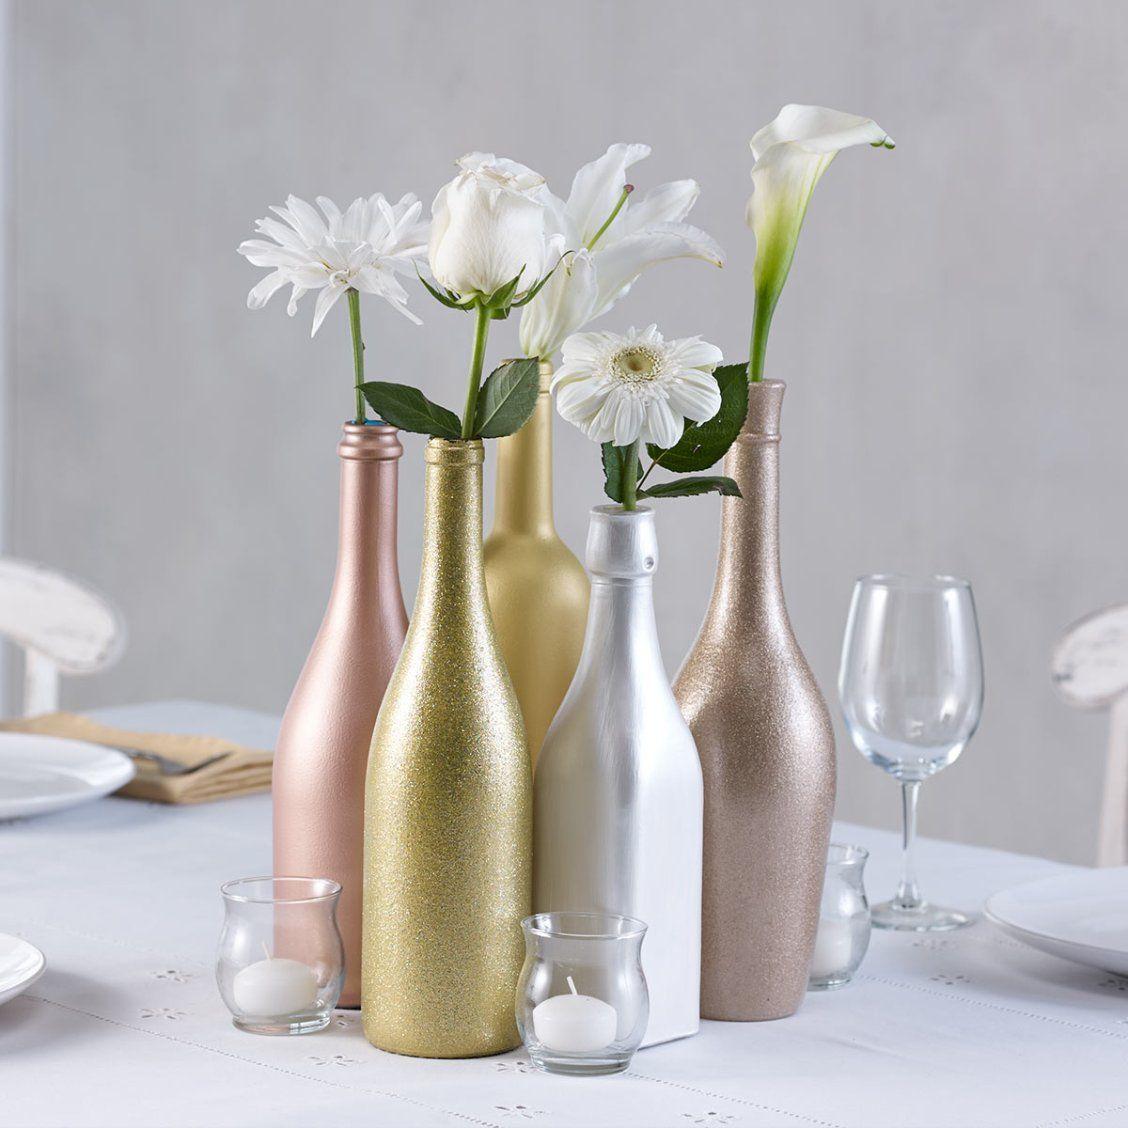 DIY Wedding Centerpiece - Metallic Bottles | Art Painted Bottles ...